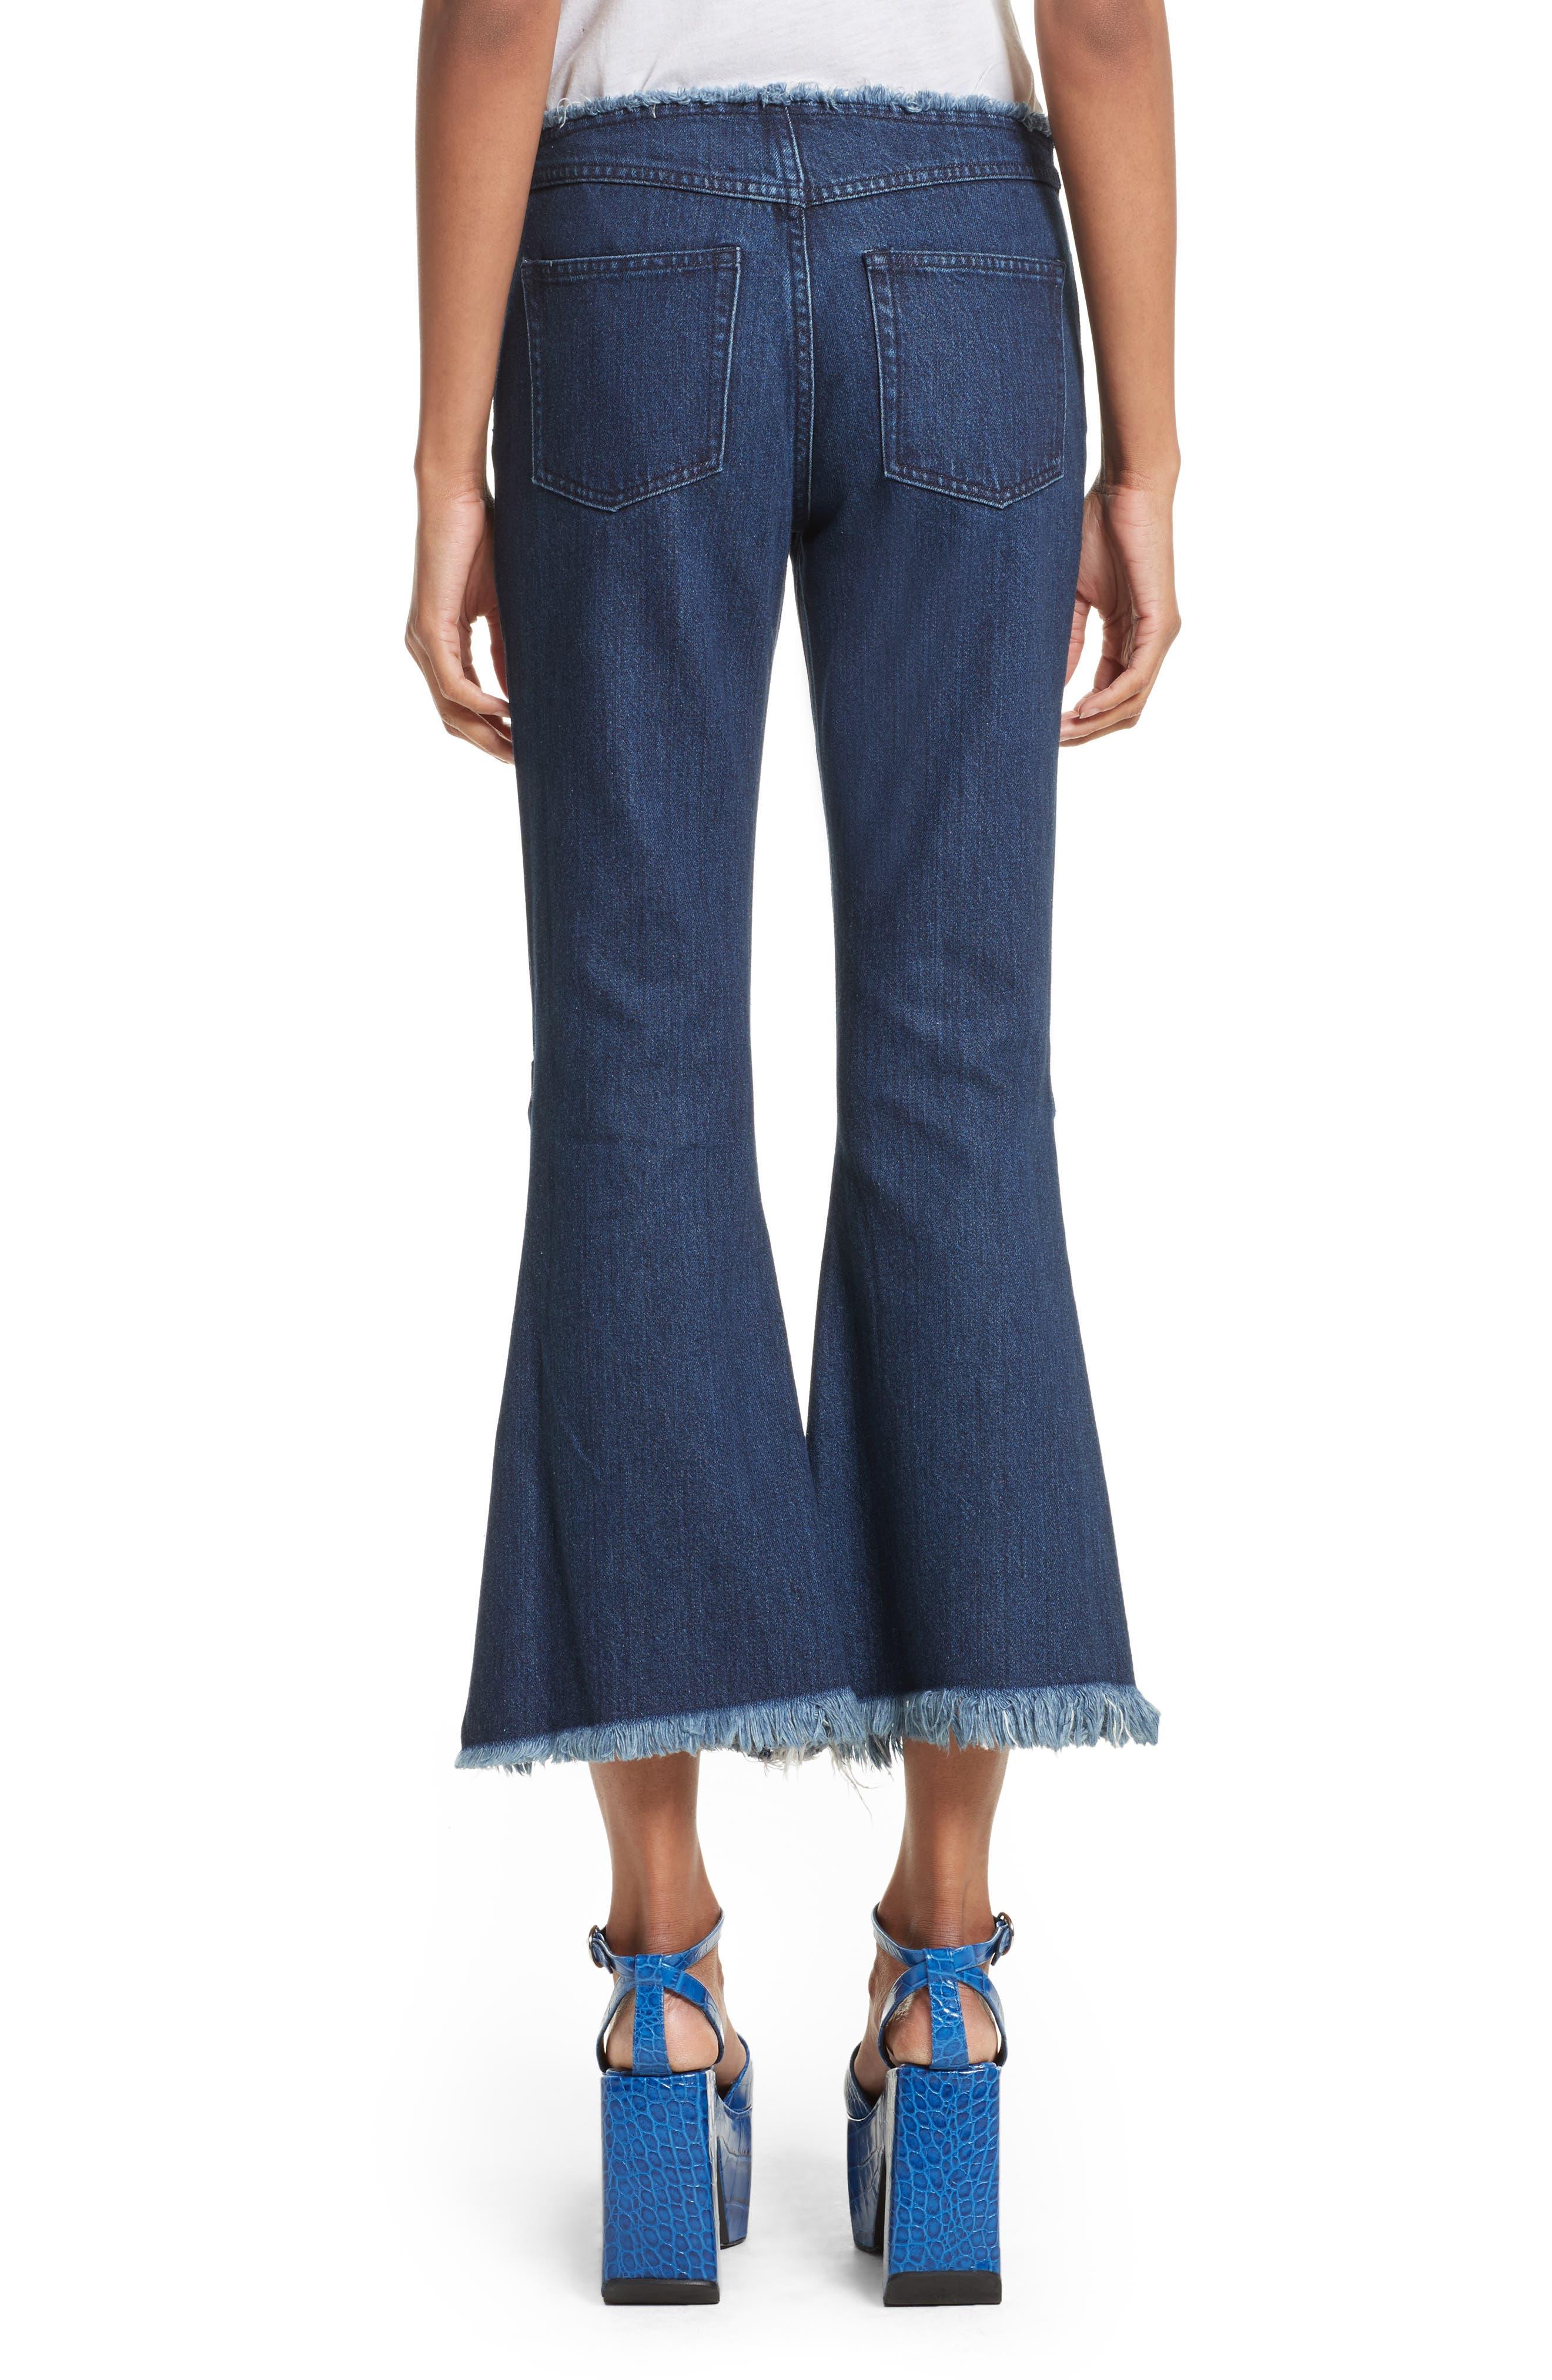 Marques'Almeida Button Trim Crop Flare Jeans,                             Alternate thumbnail 2, color,                             420